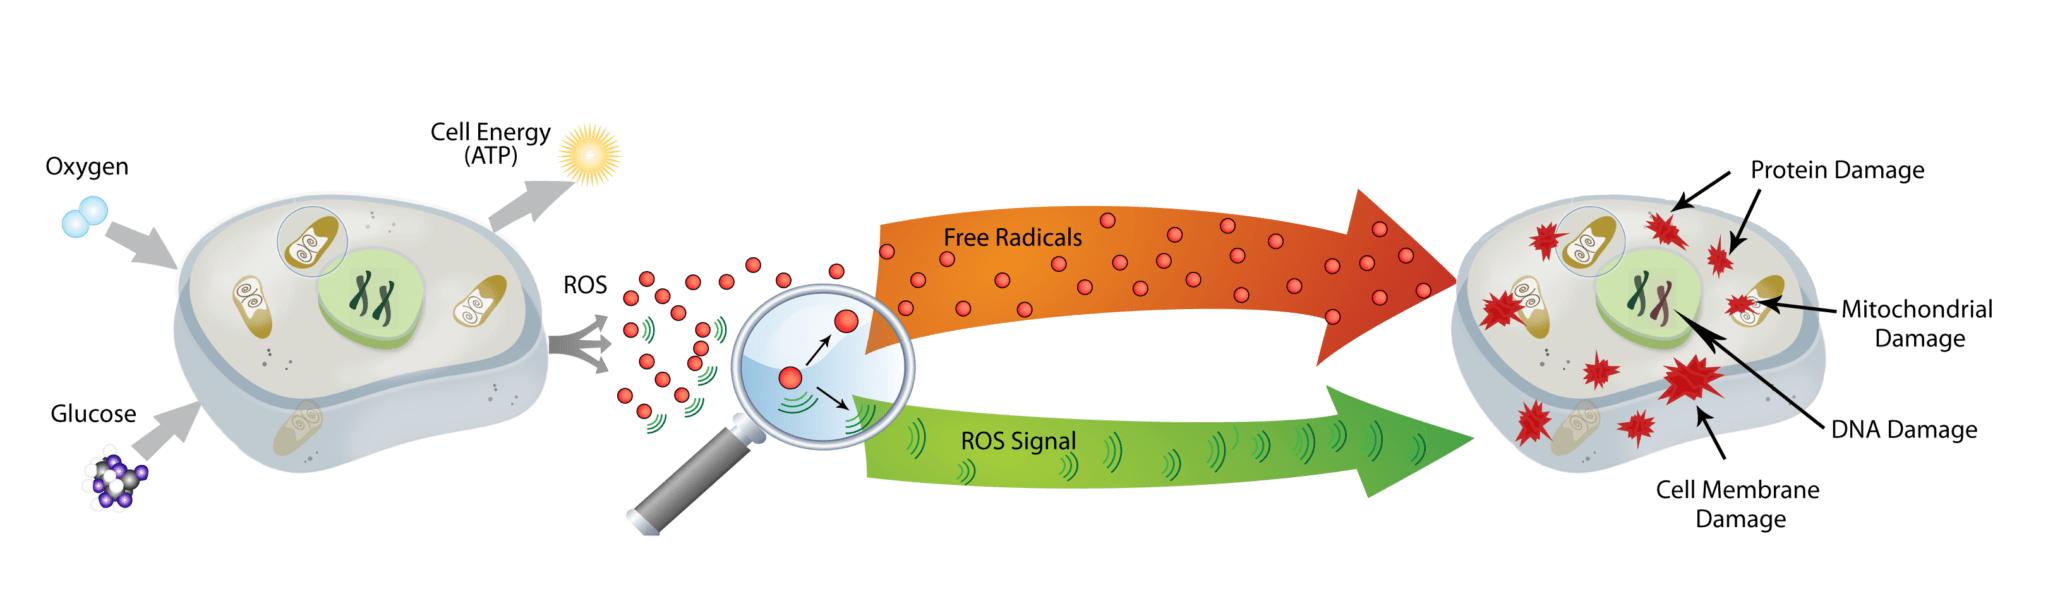 NanoVi and free radicals